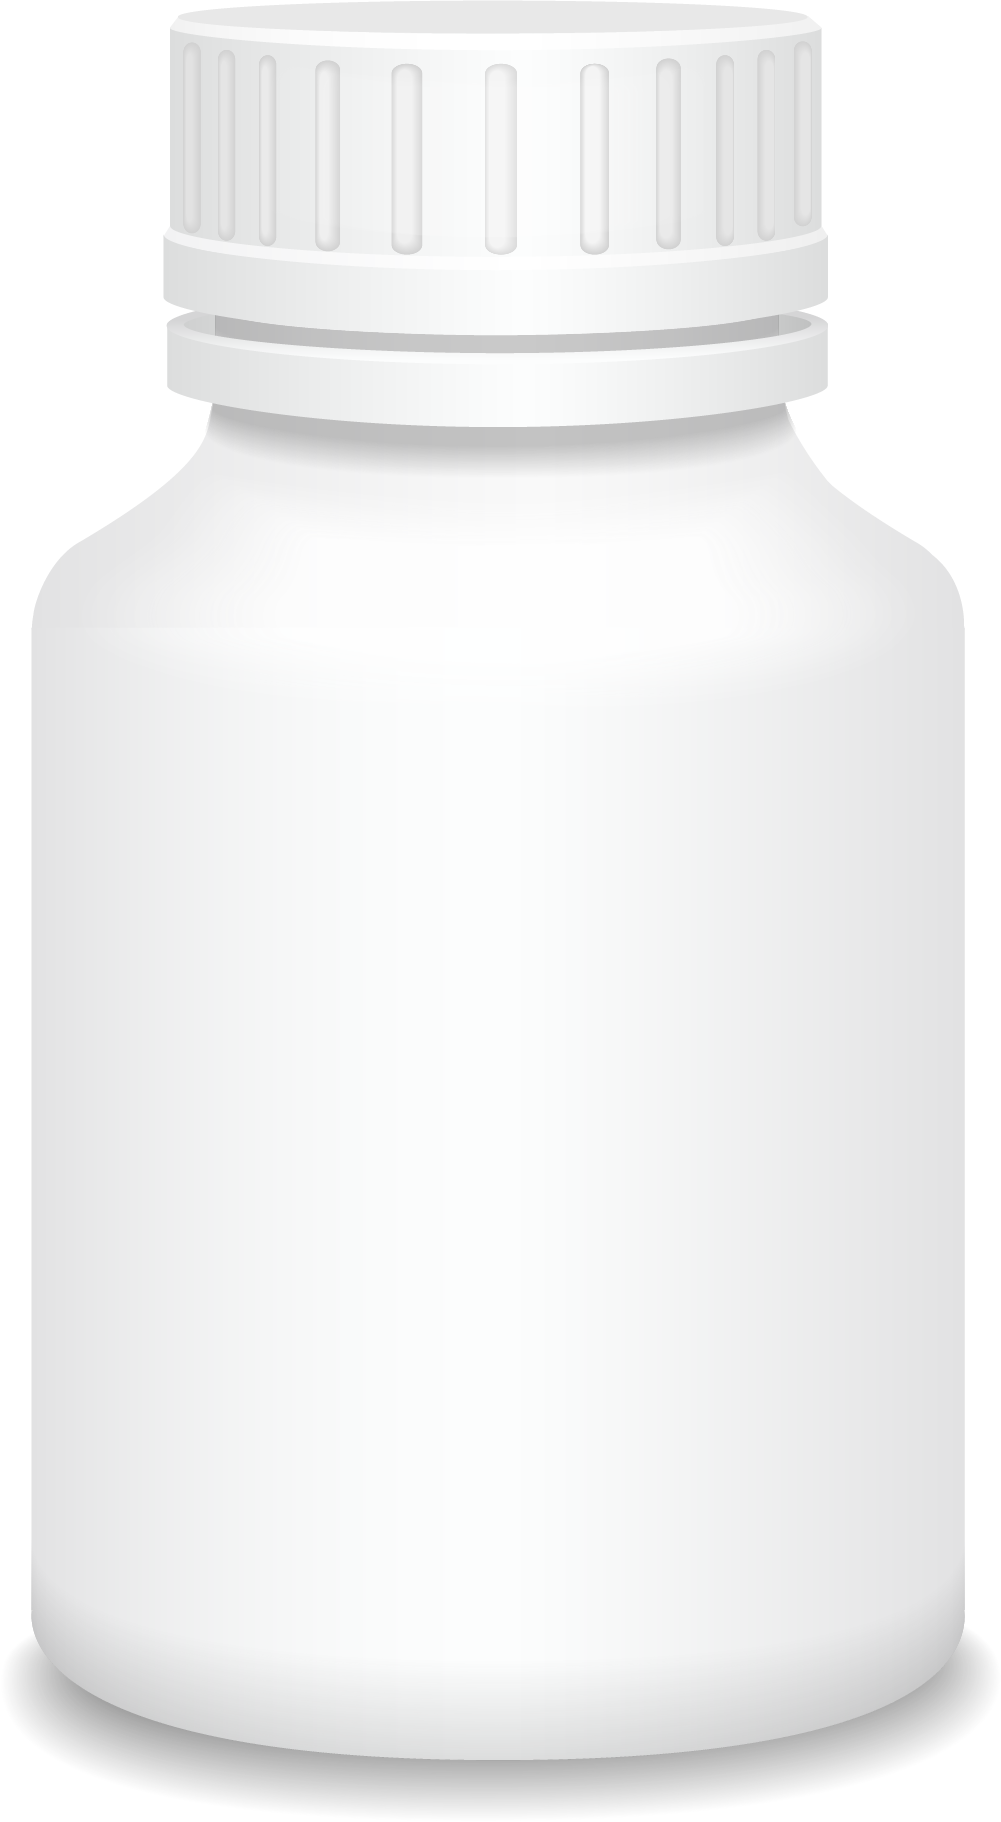 Plastic Bag Plastic Pollution Plastic Bottle Plastics Industry Bottle Free Png Plastic Bottles Recycle Plastic Bottles Bottle Drawing